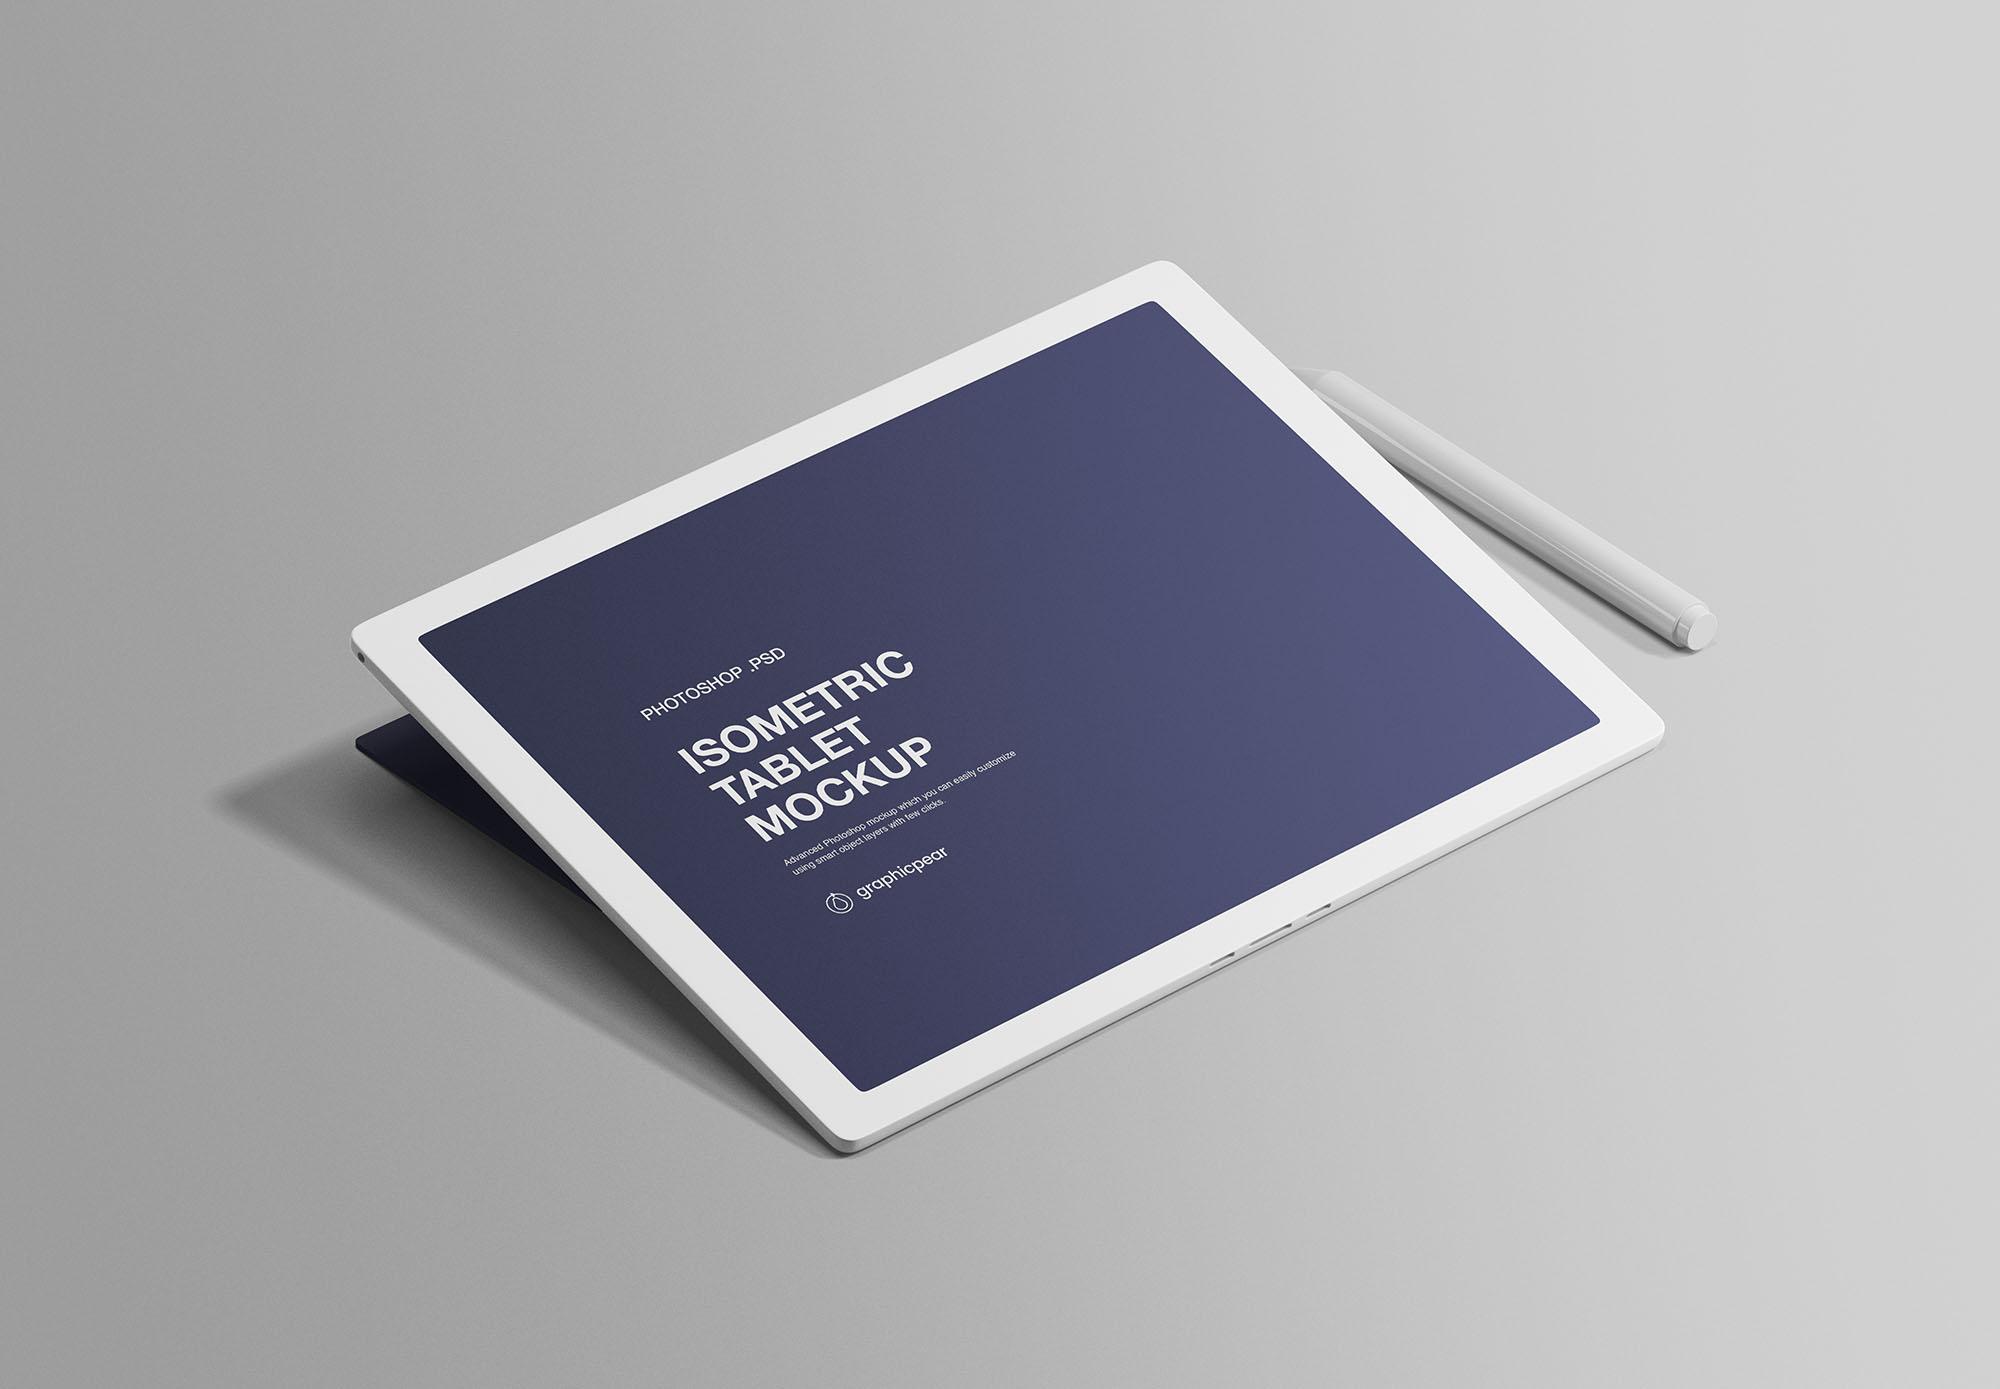 Free Isometric Tablet Mockup